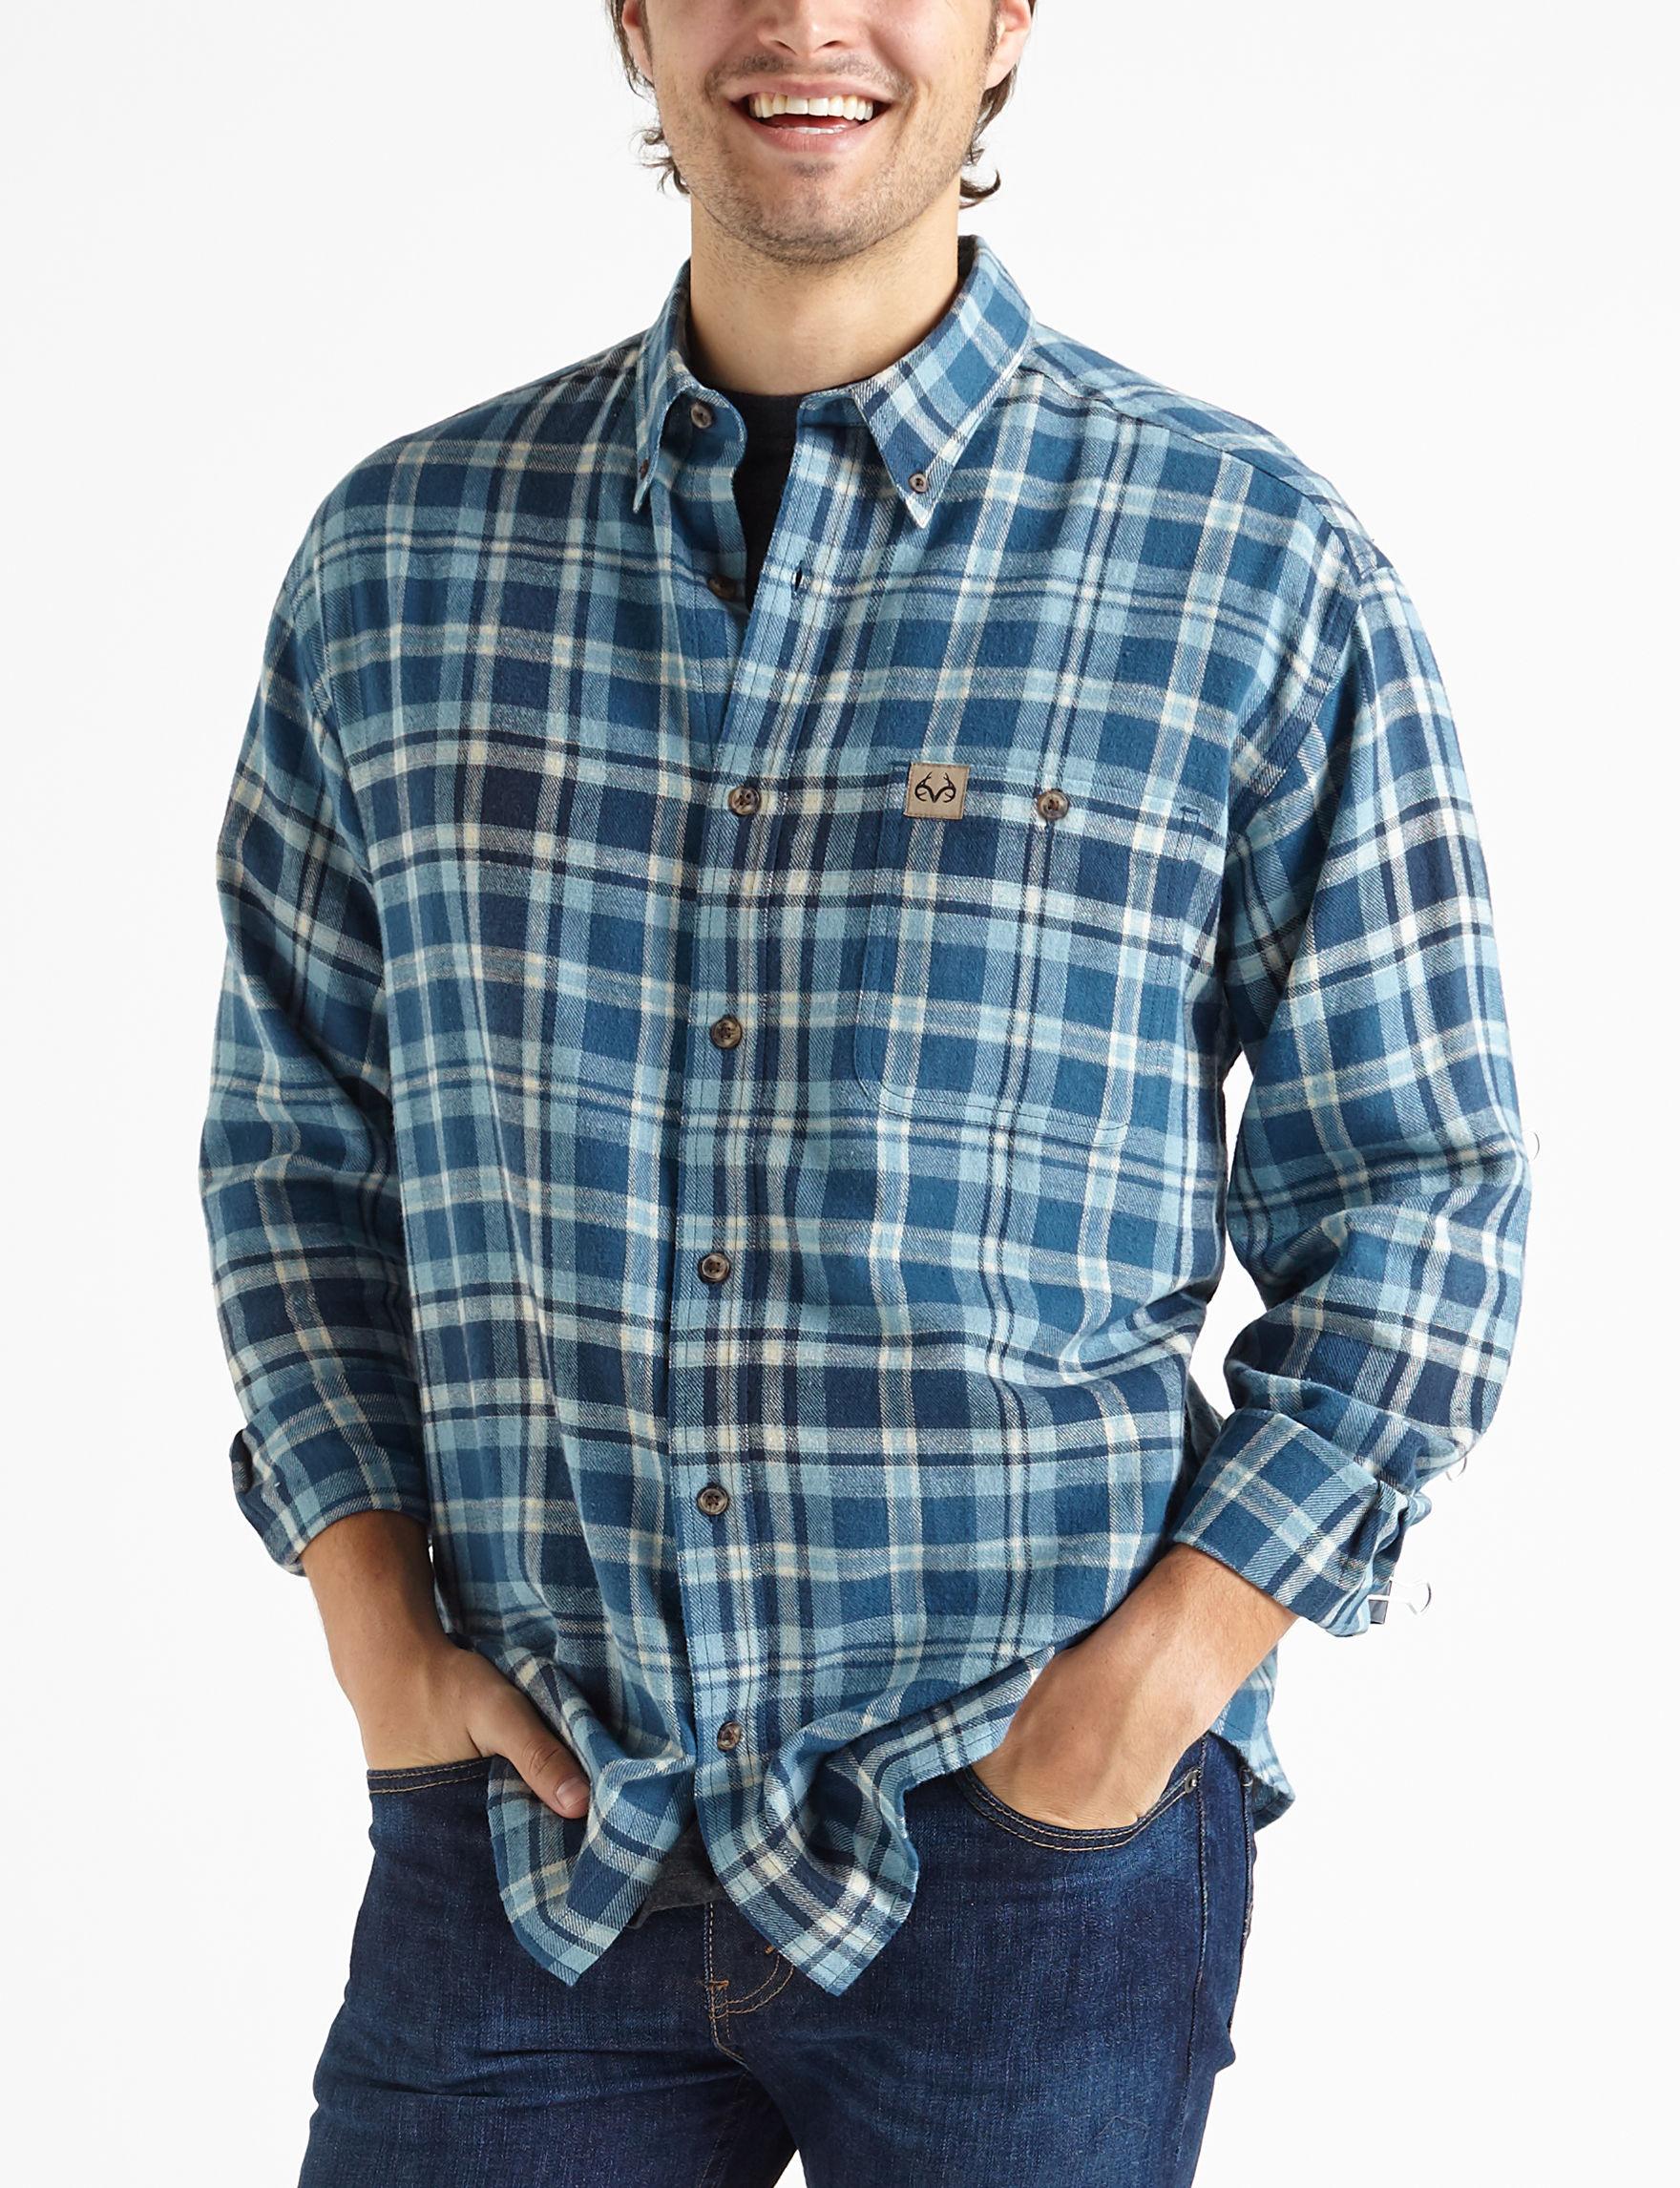 Realtree Blue Plaid Casual Button Down Shirts